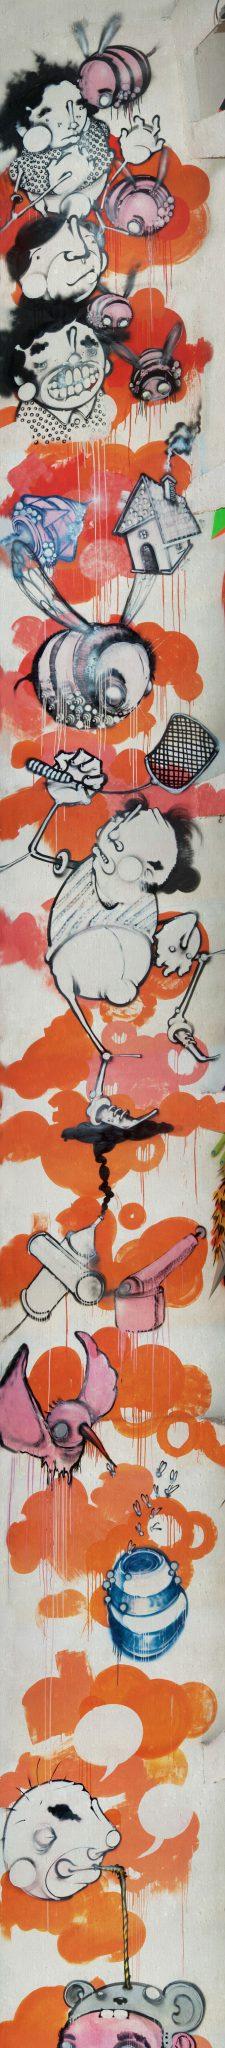 Graffitti do artista Onesto